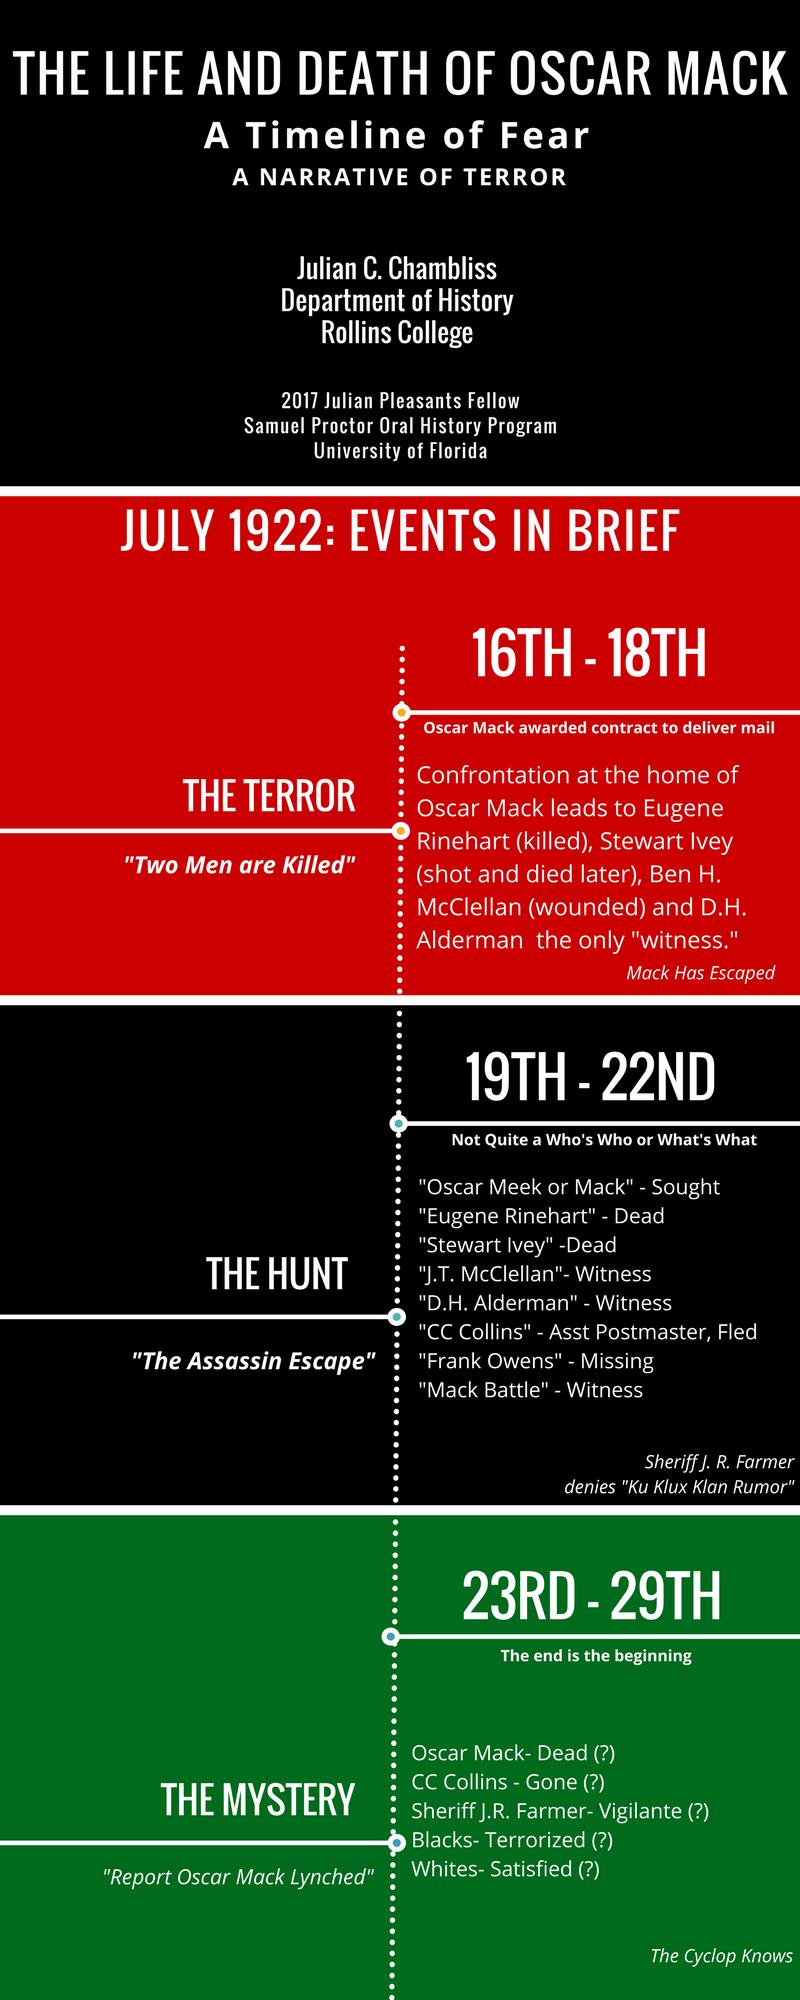 A Timeline for Oscar Mack